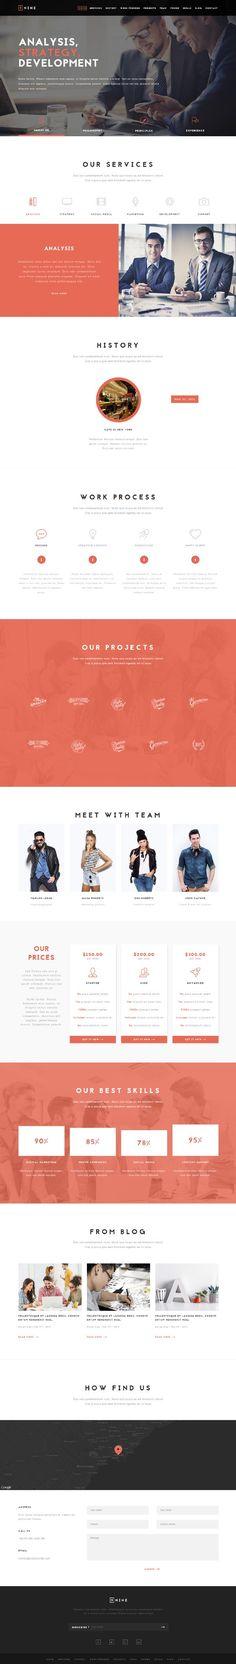 Nine - Multipurpose Unique One Page template #html5templates #psdtemplates #responsivedesign #webtemplates